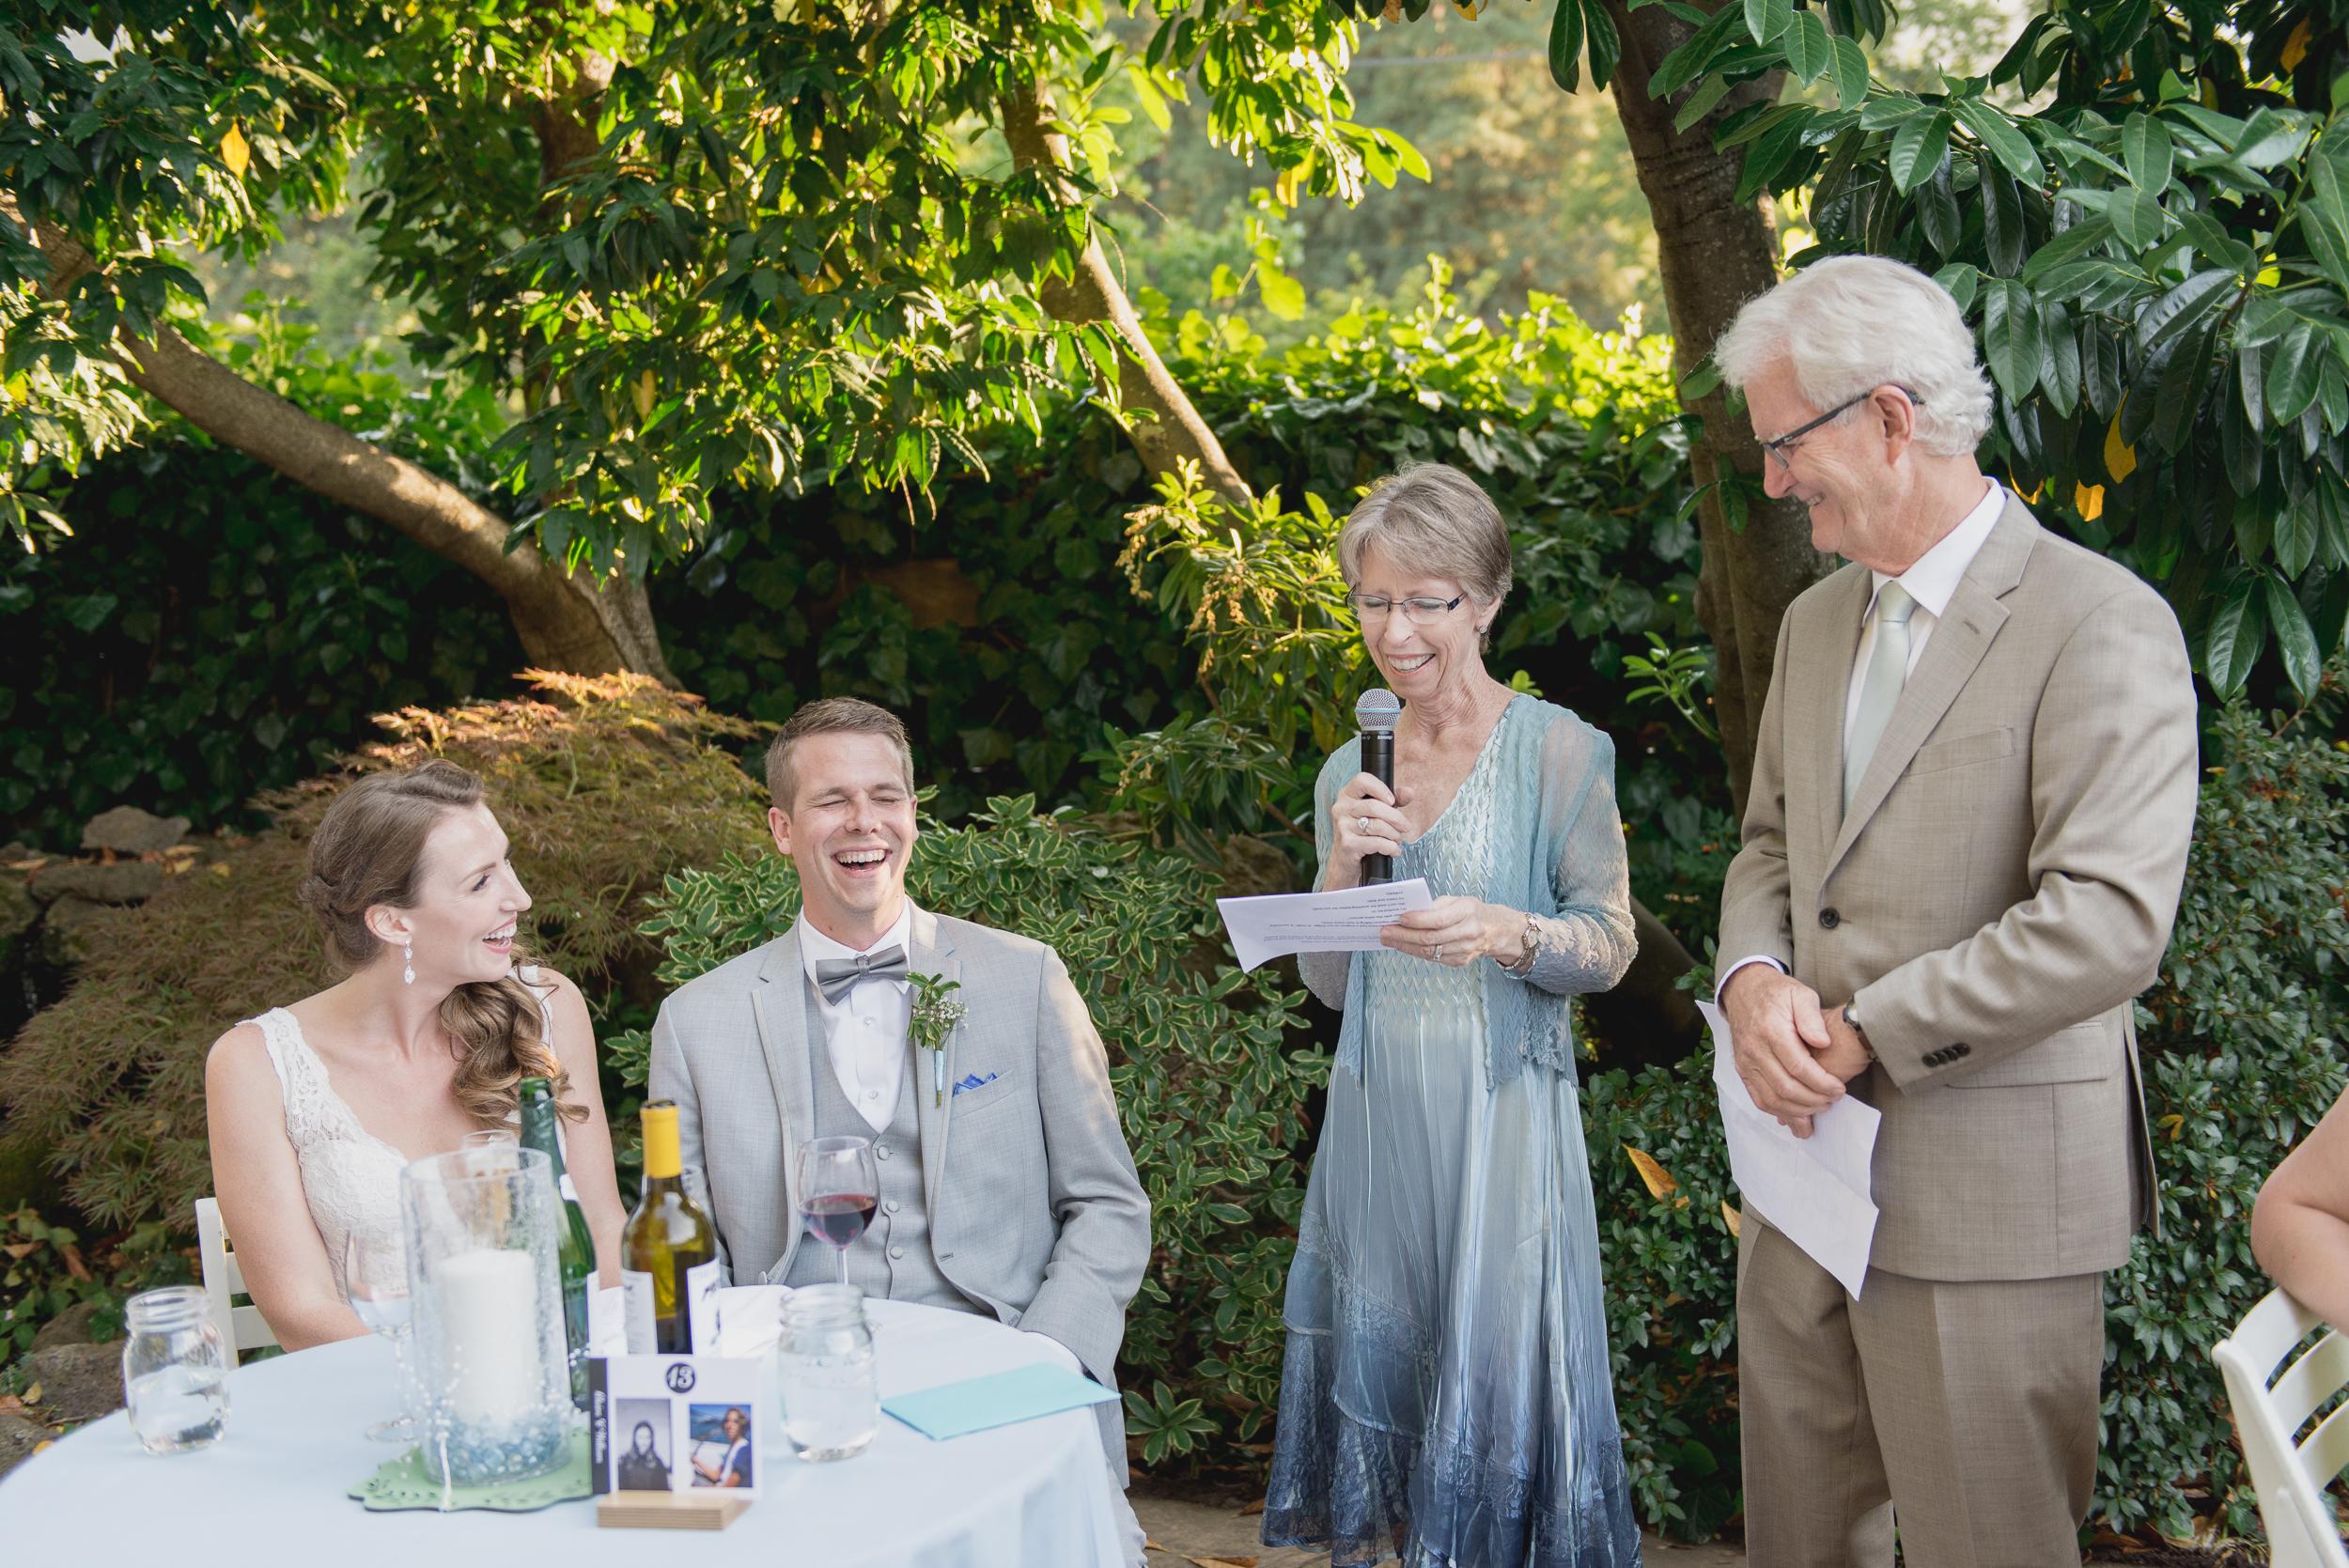 38-down-to-earth-marin-art-garden-center-wedding-vivianchen.jpg